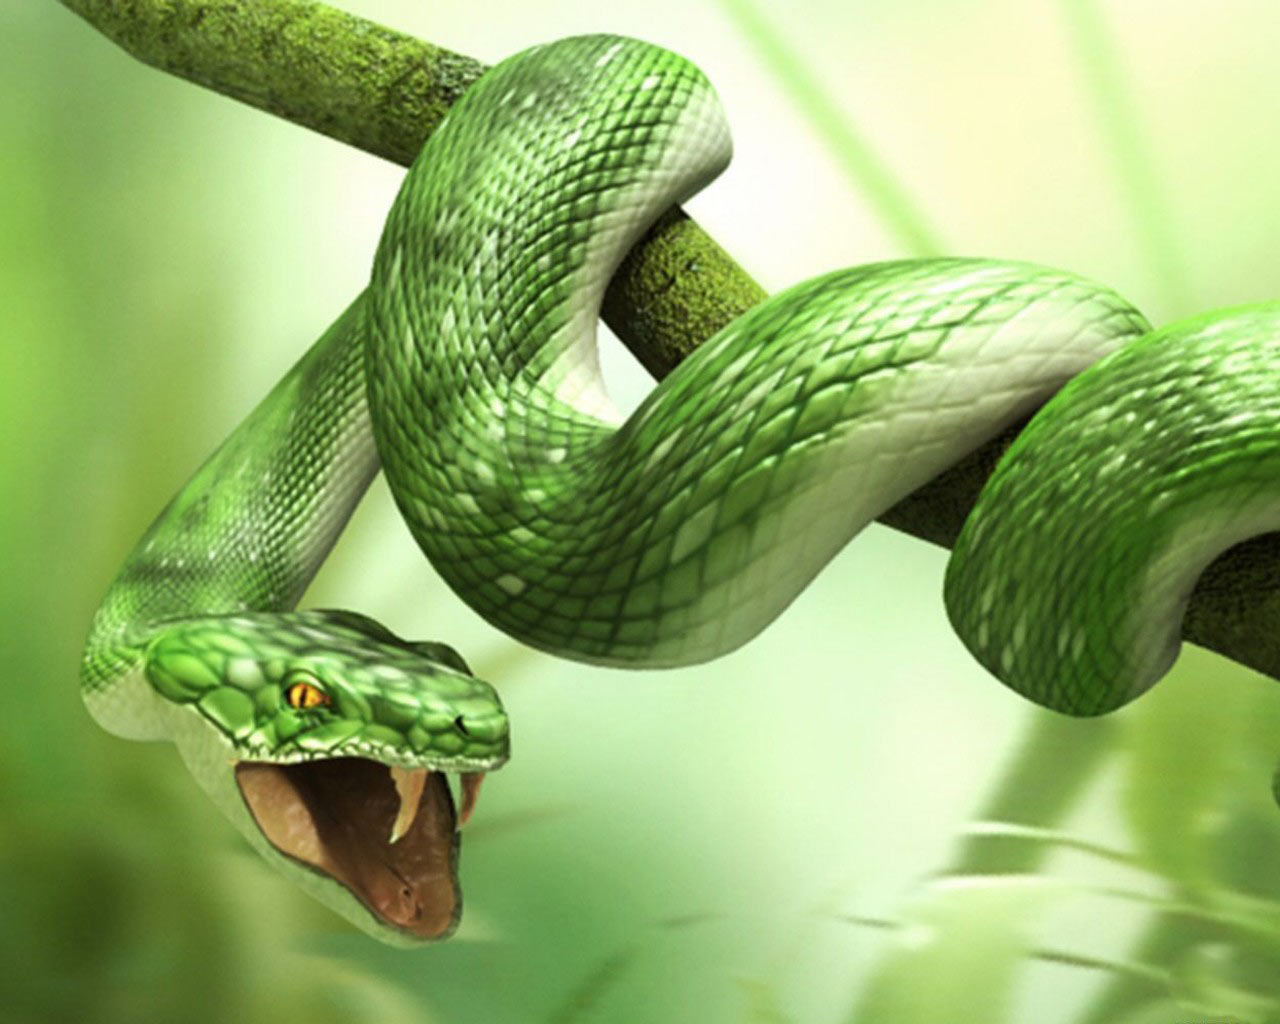 http://2.bp.blogspot.com/-jfwlQVBNdzQ/UCOc1OhCdcI/AAAAAAAABDU/QZjpTP4J_n4/s1600/3d_wallpaper-animals_Snake.jpg